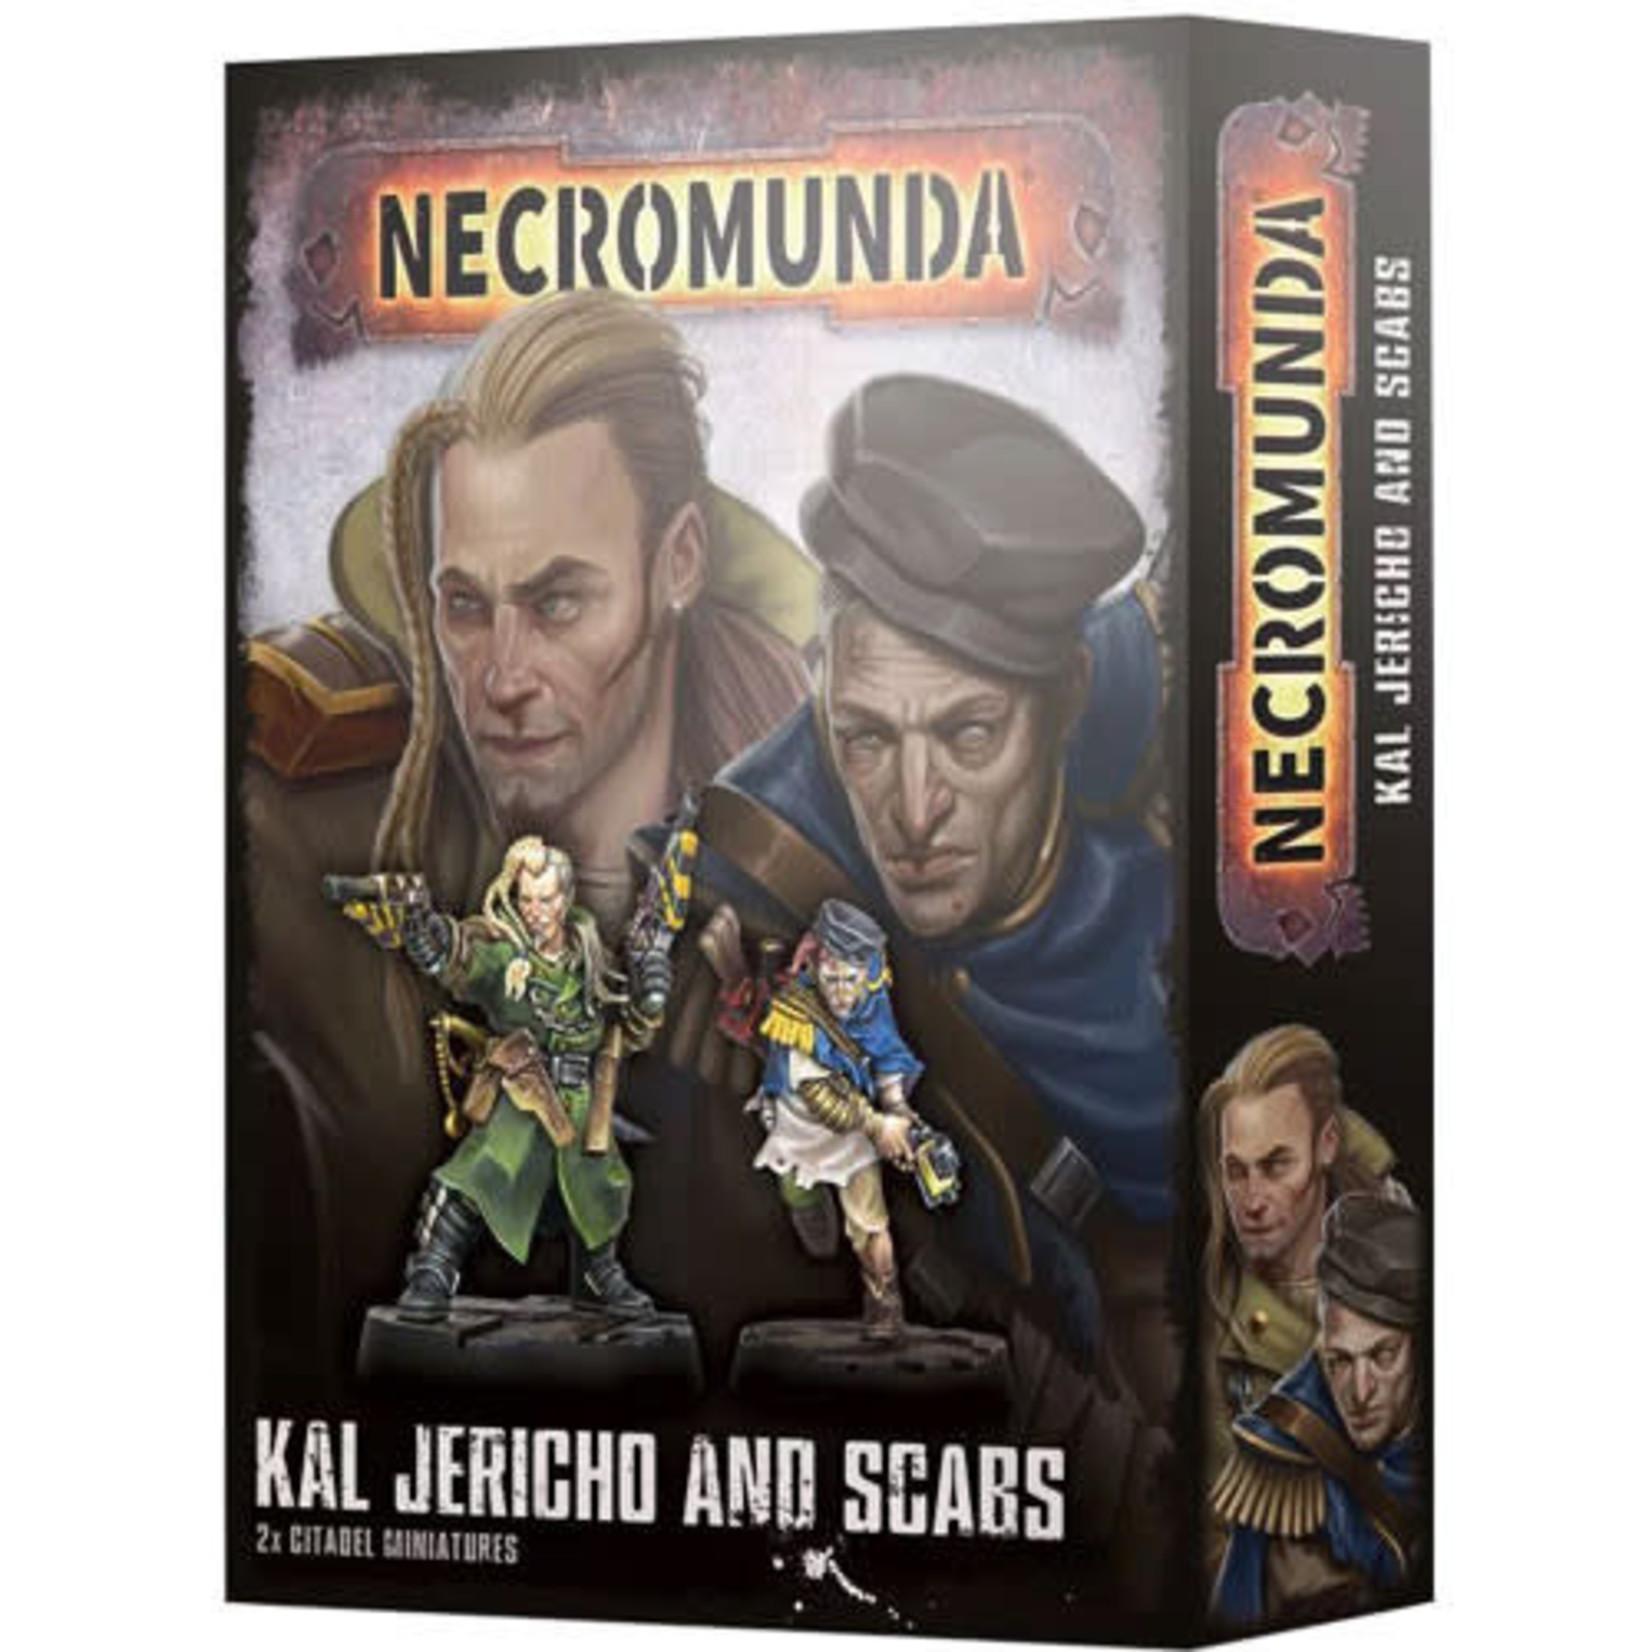 Necromunda Kal Jericho and Scabs